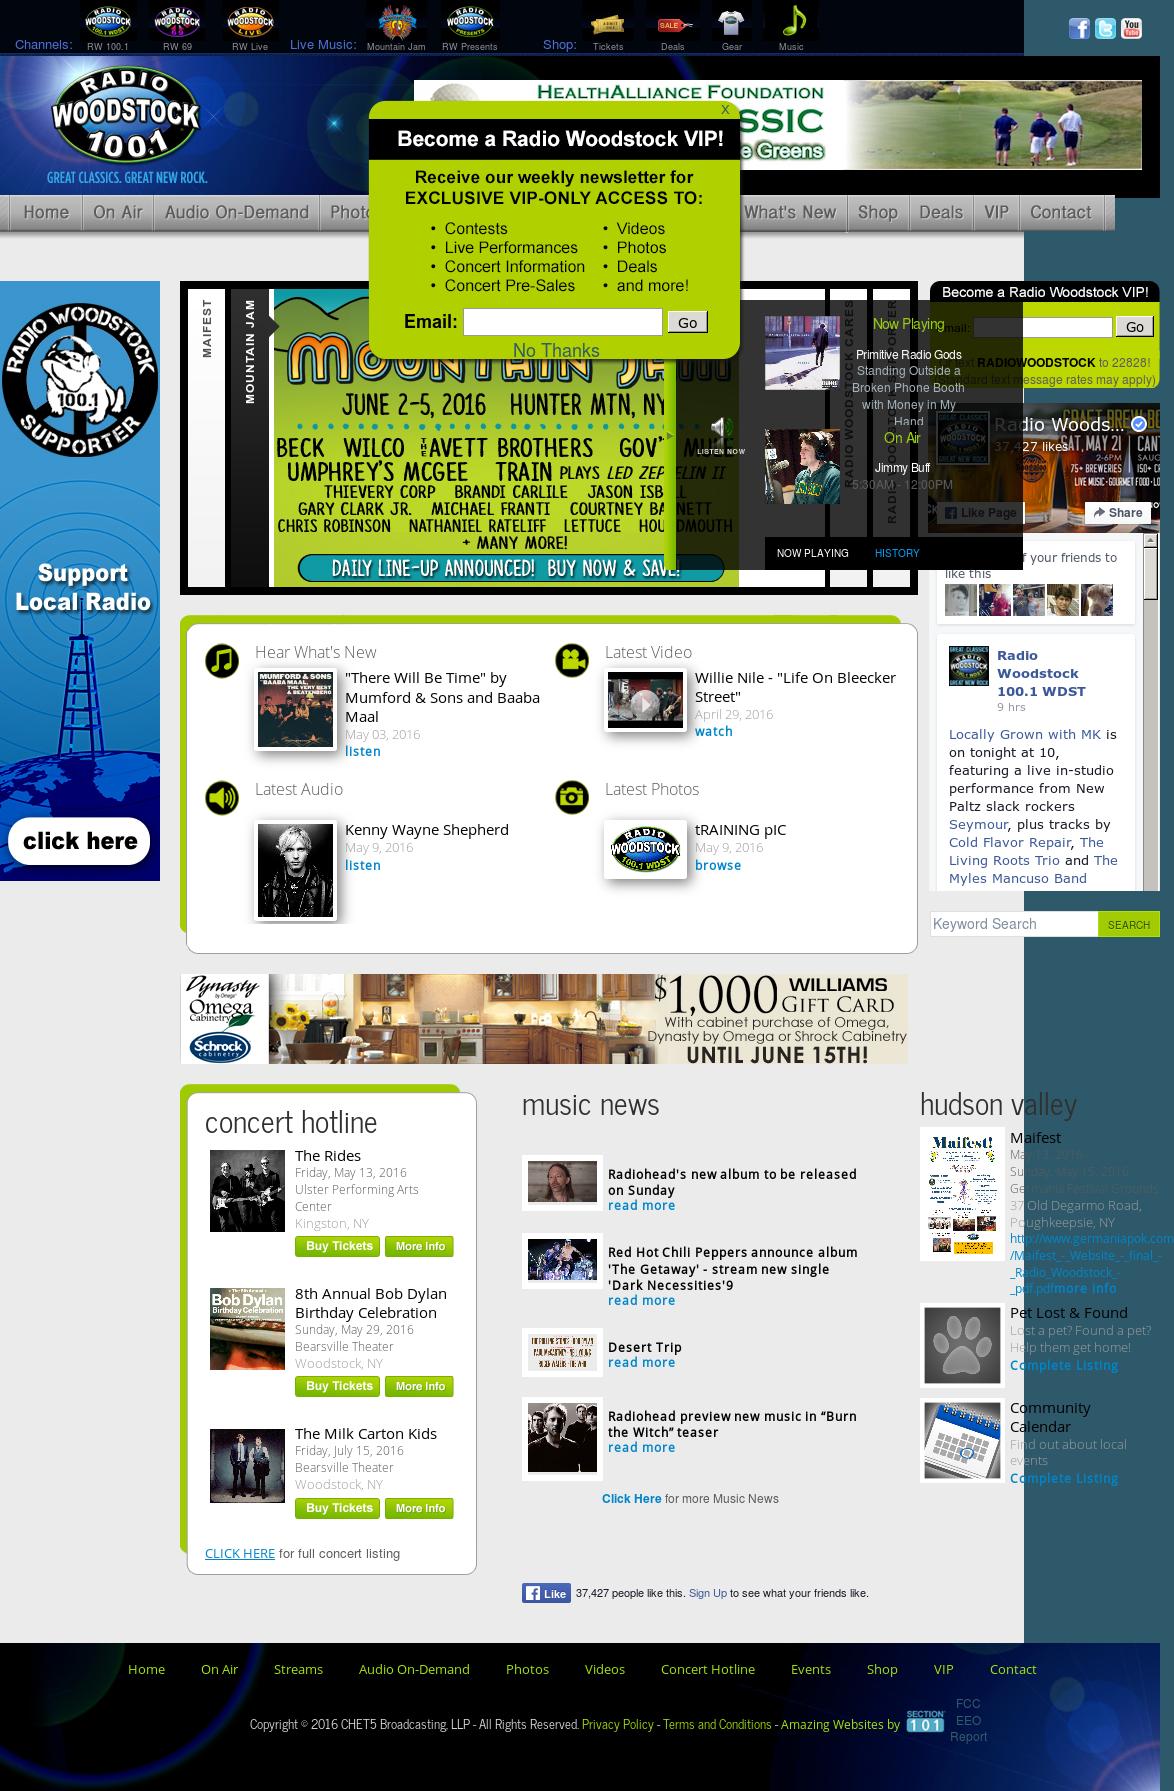 Radio Woodstock 100 1 Competitors, Revenue and Employees